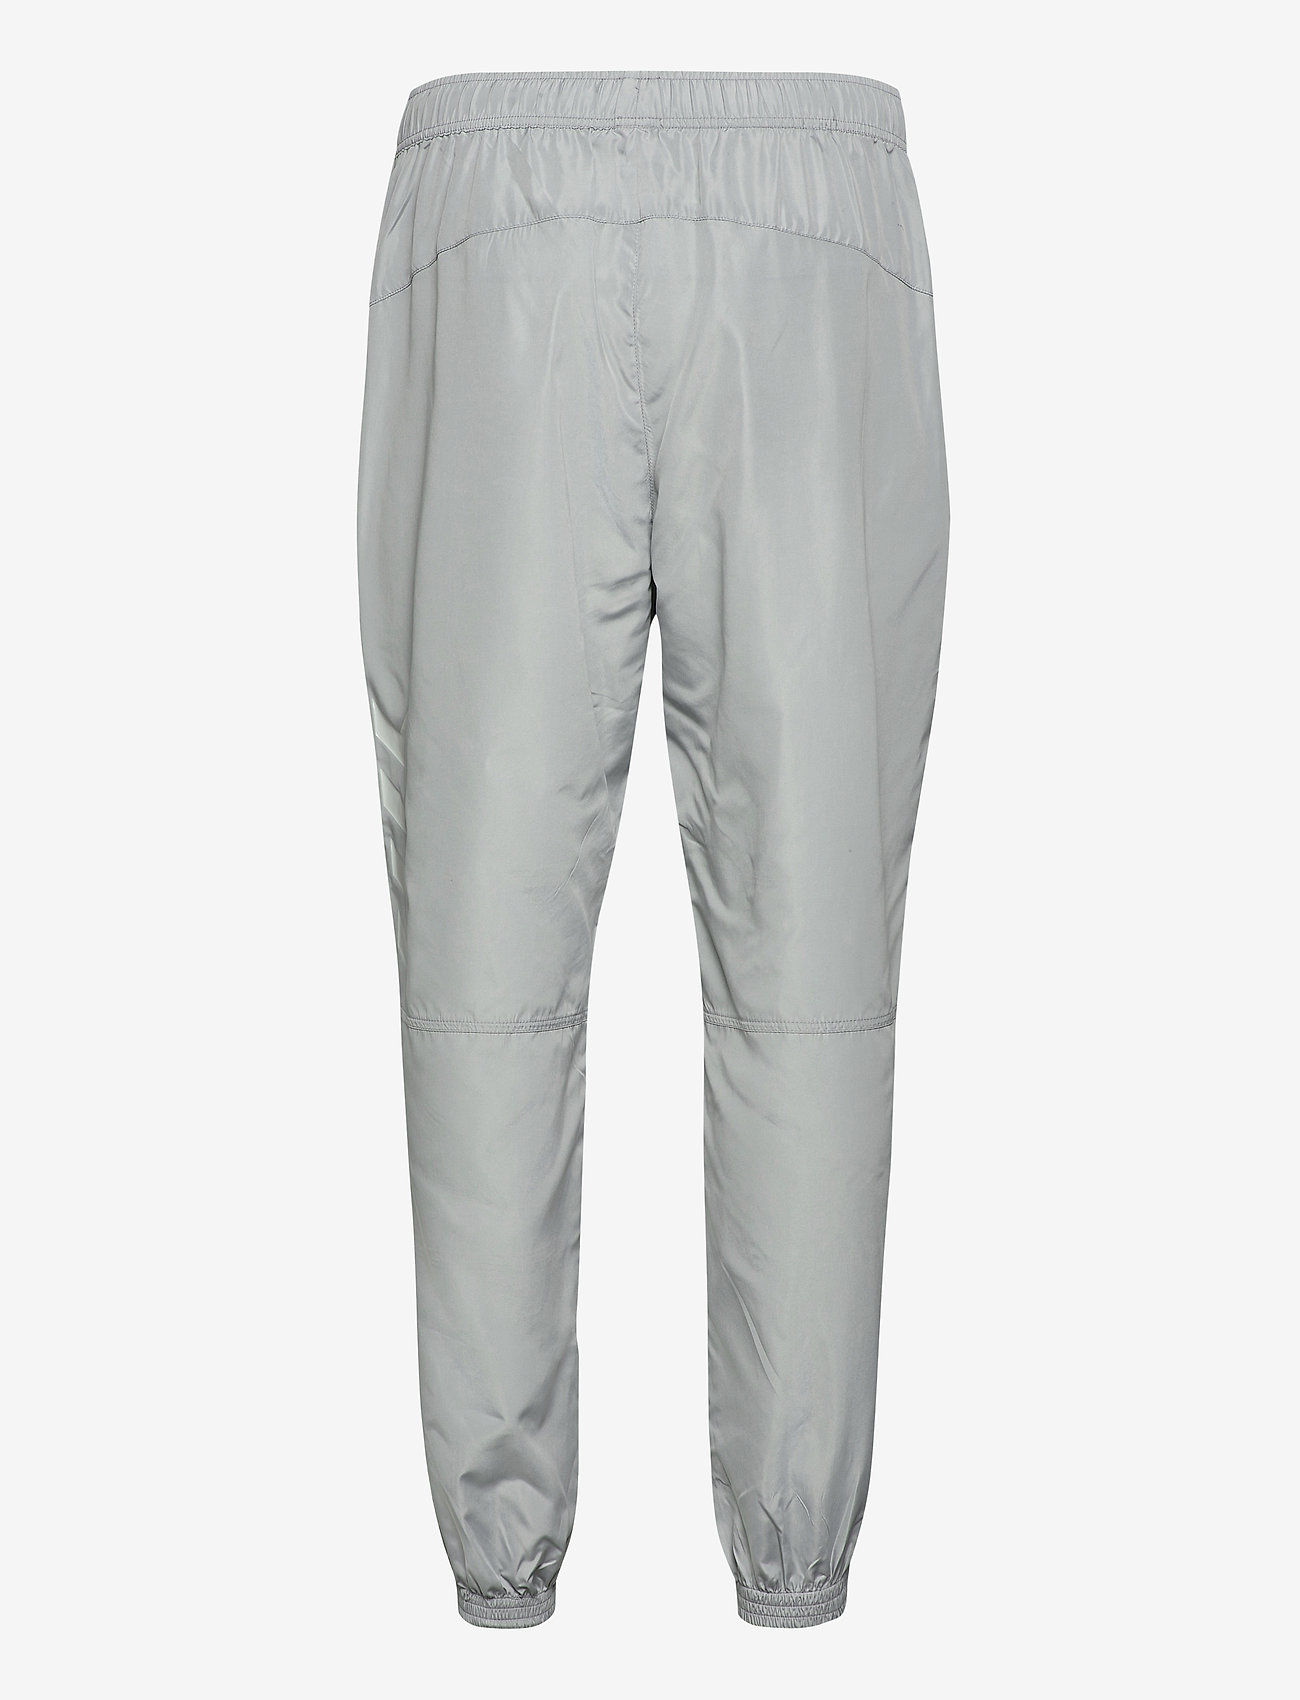 Hummel - hmlMAGNUS LOOSE PANTS - spodnie treningowe - quarry - 1